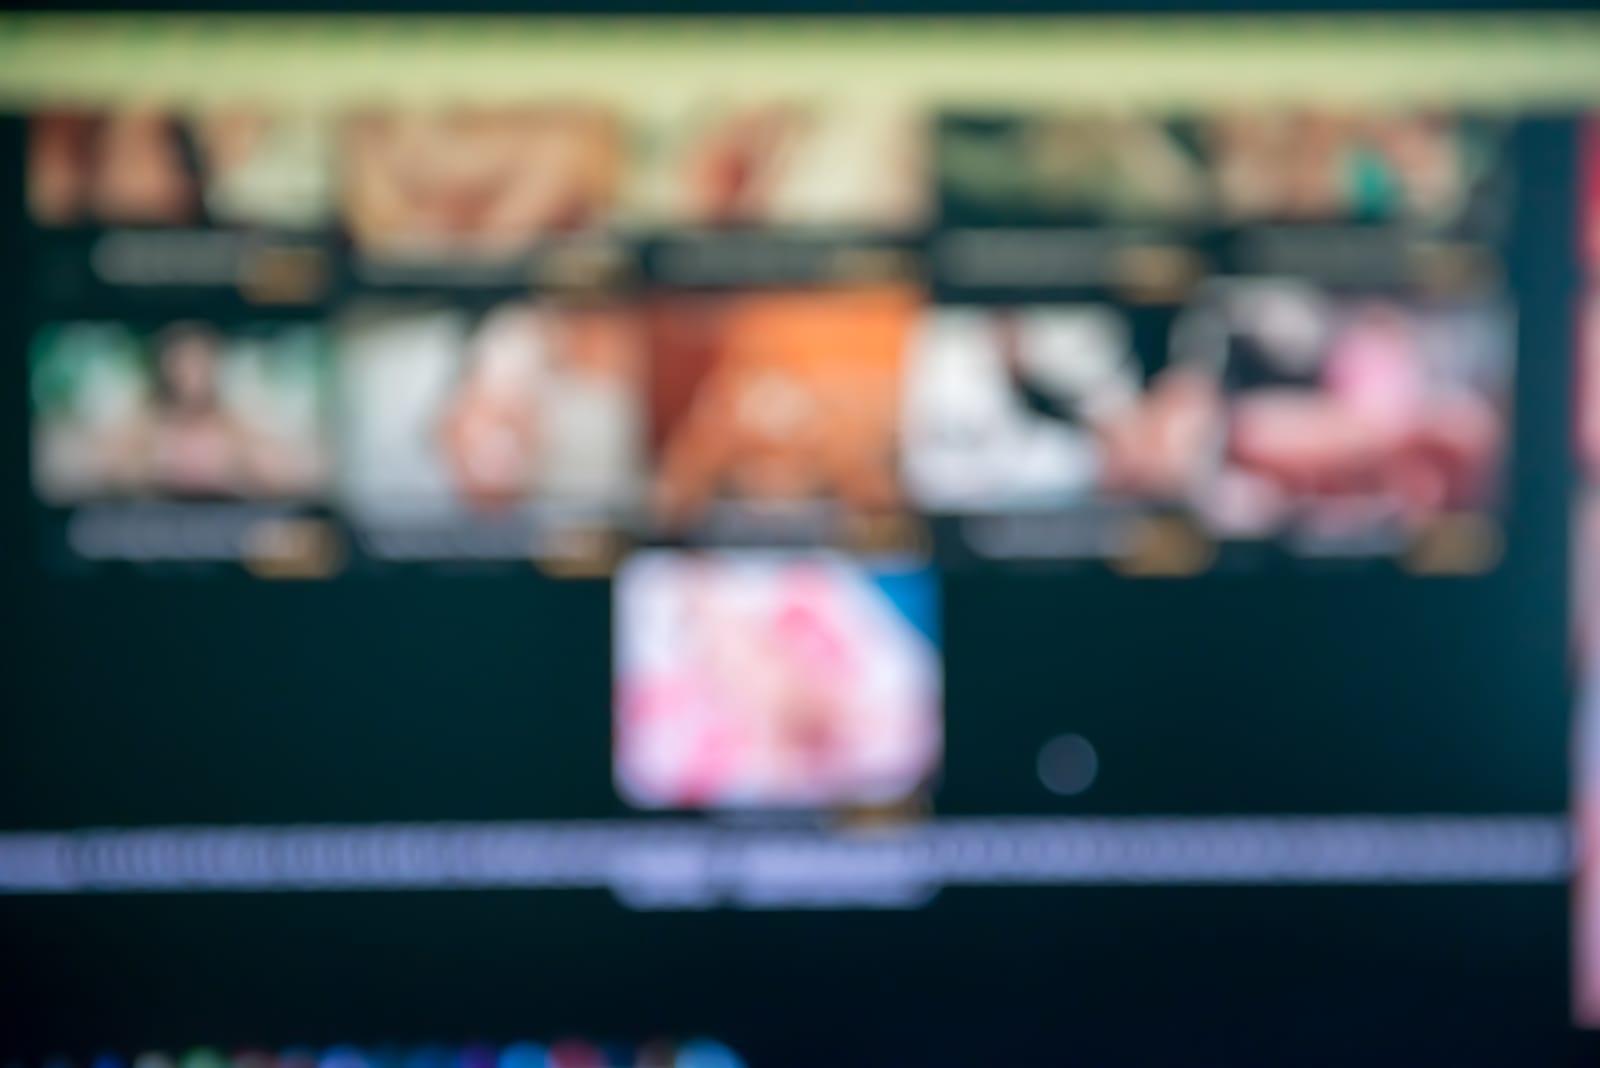 iran censored porn so hard it broke the internet in hong kong